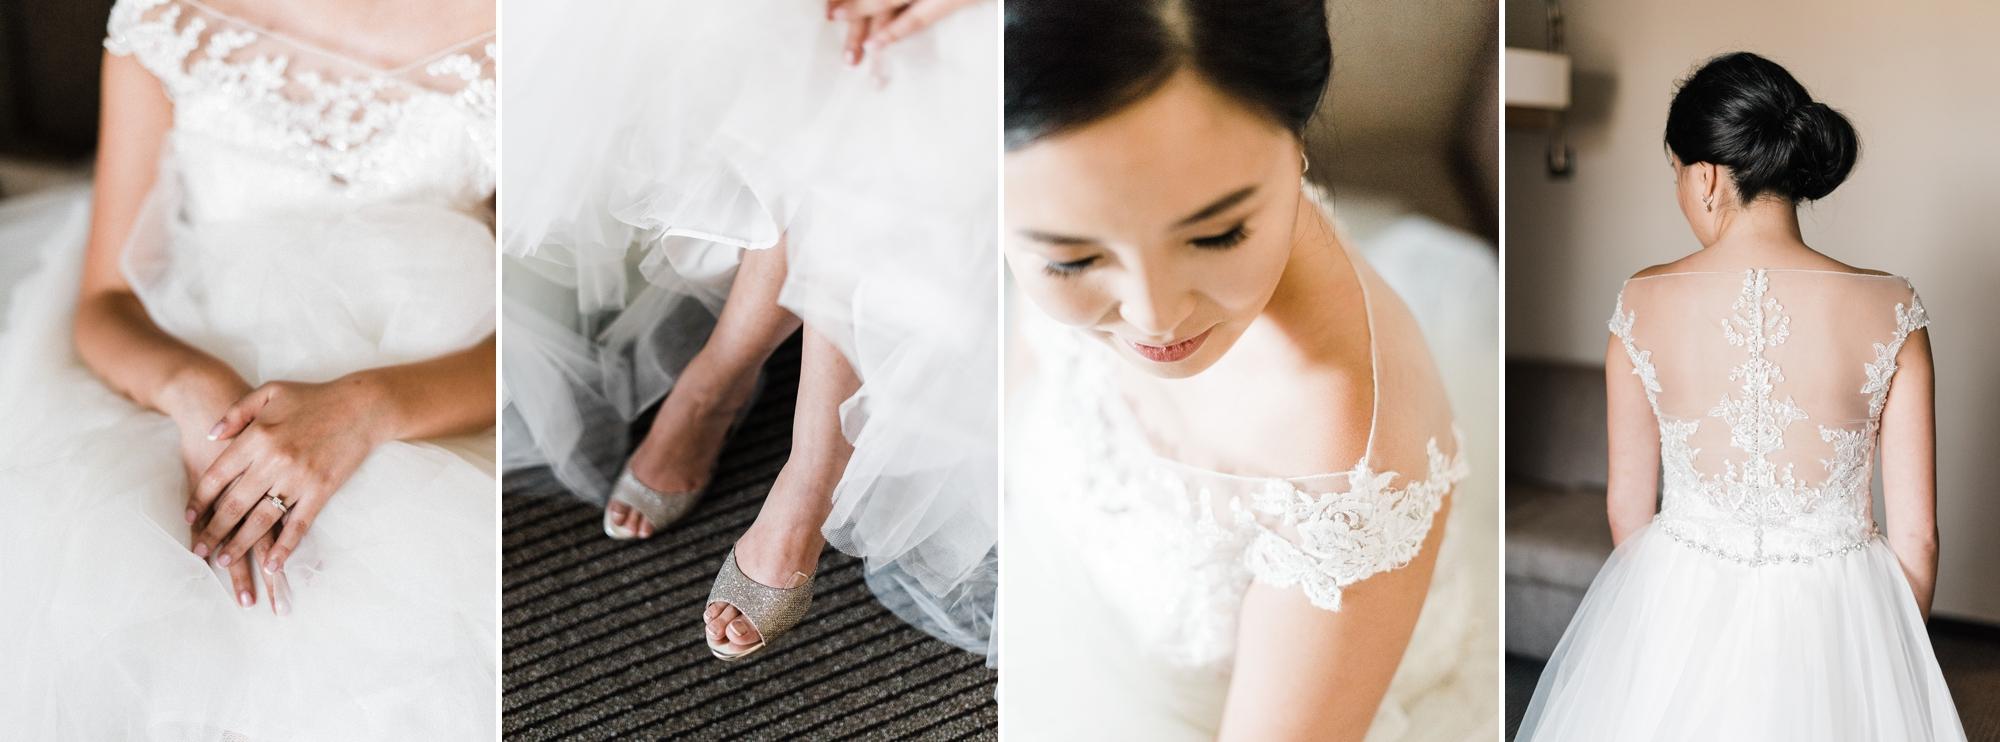 Wedding Blog 8.jpg